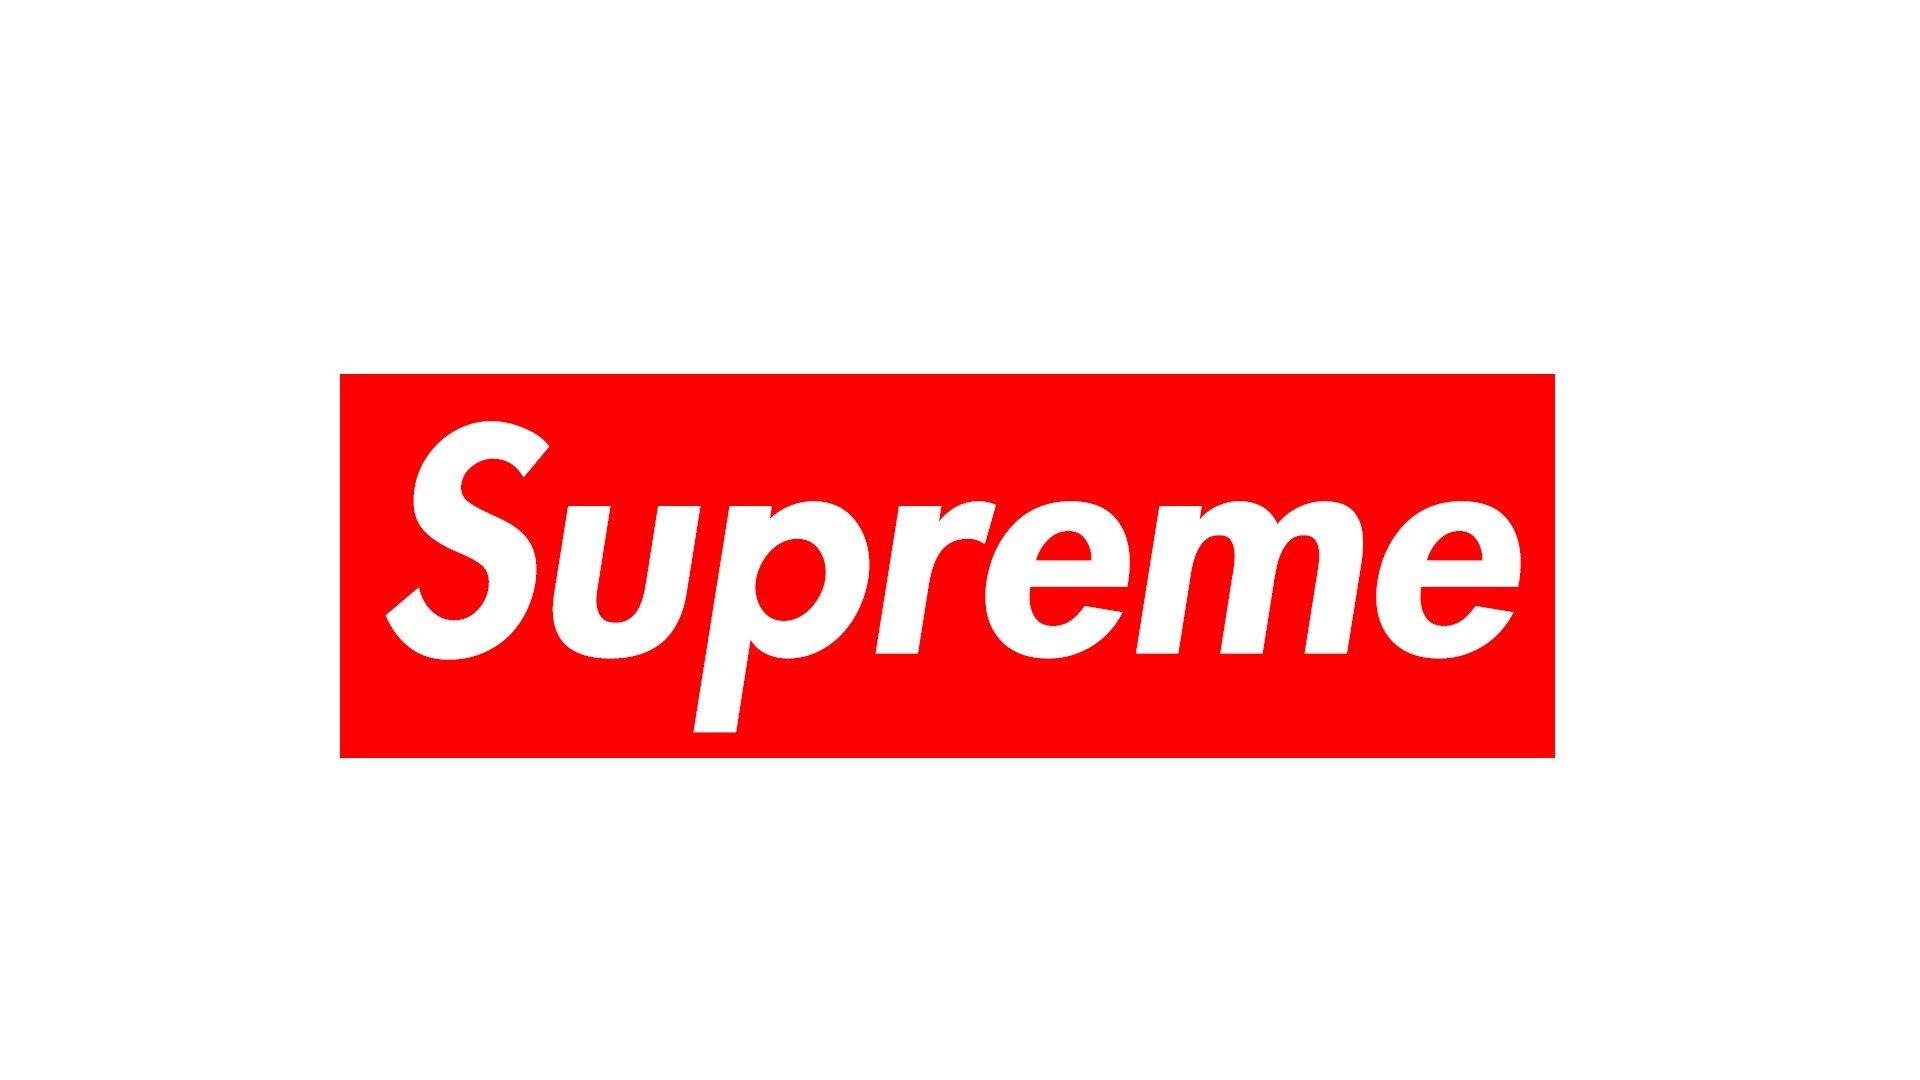 1080x1080 Supreme